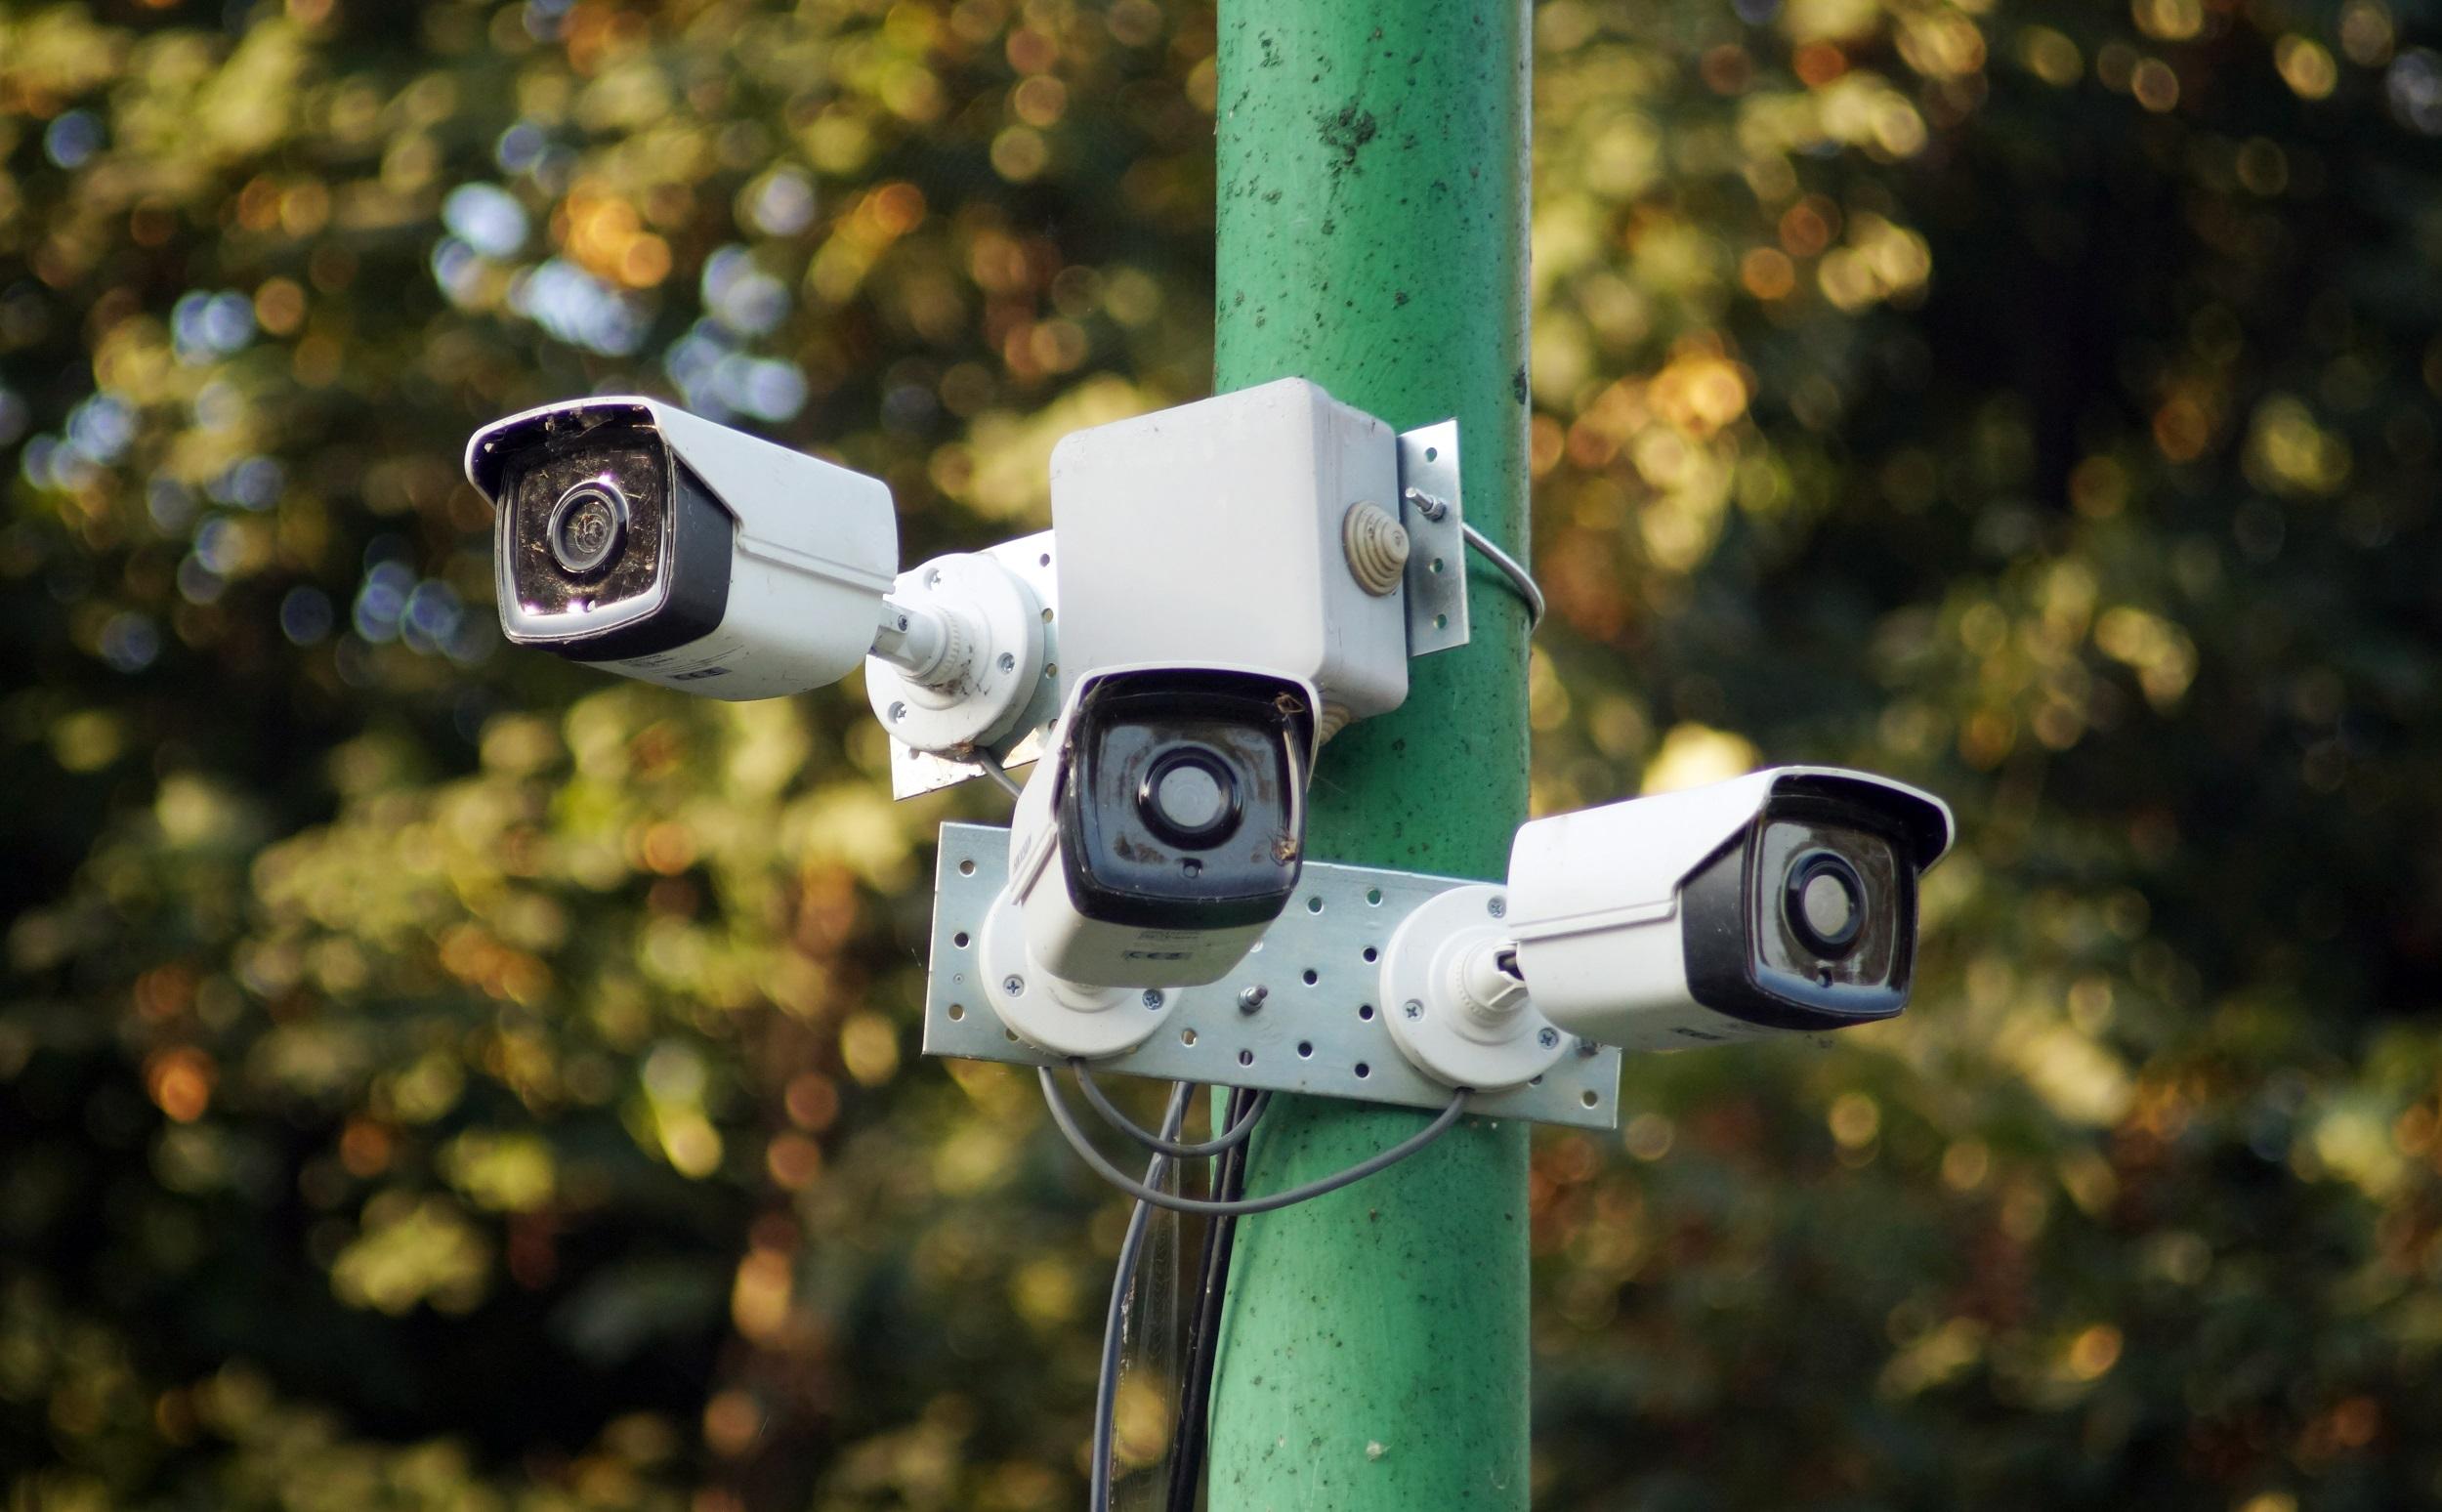 surveillance pitfalls